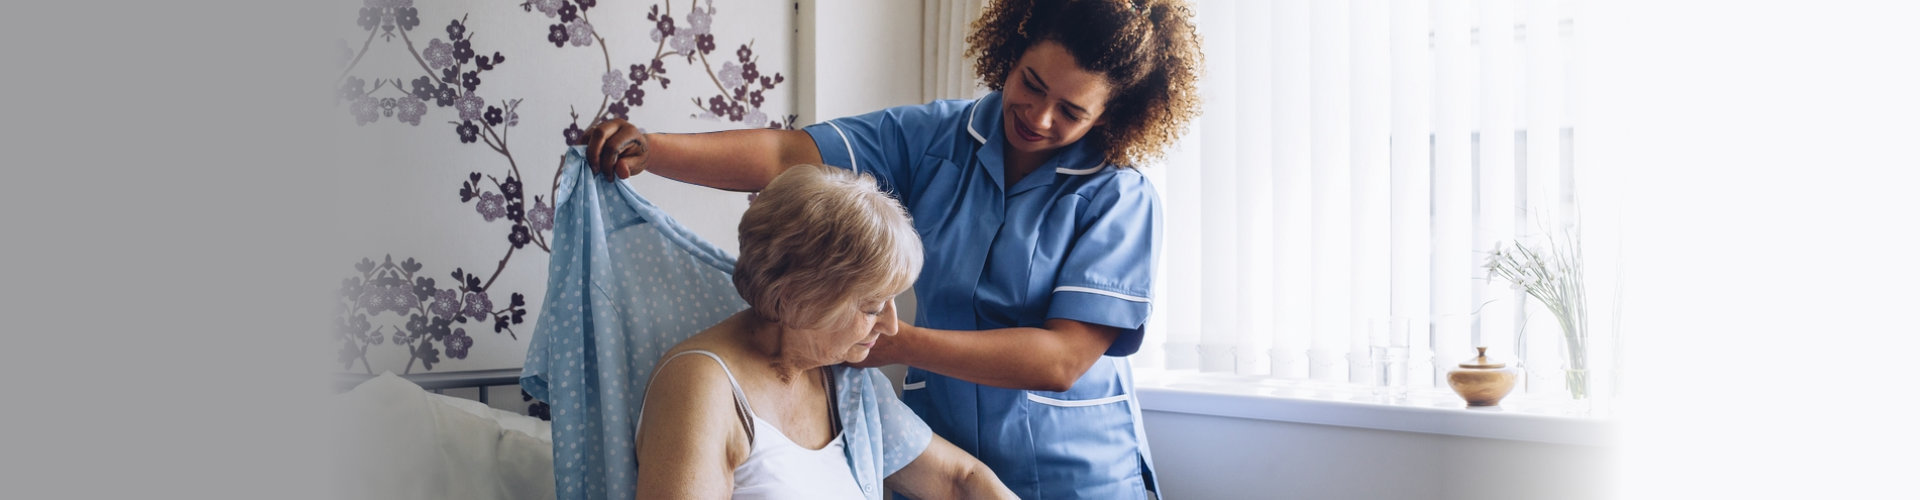 caregiver assisting senior woman getting dressed in her bedroom